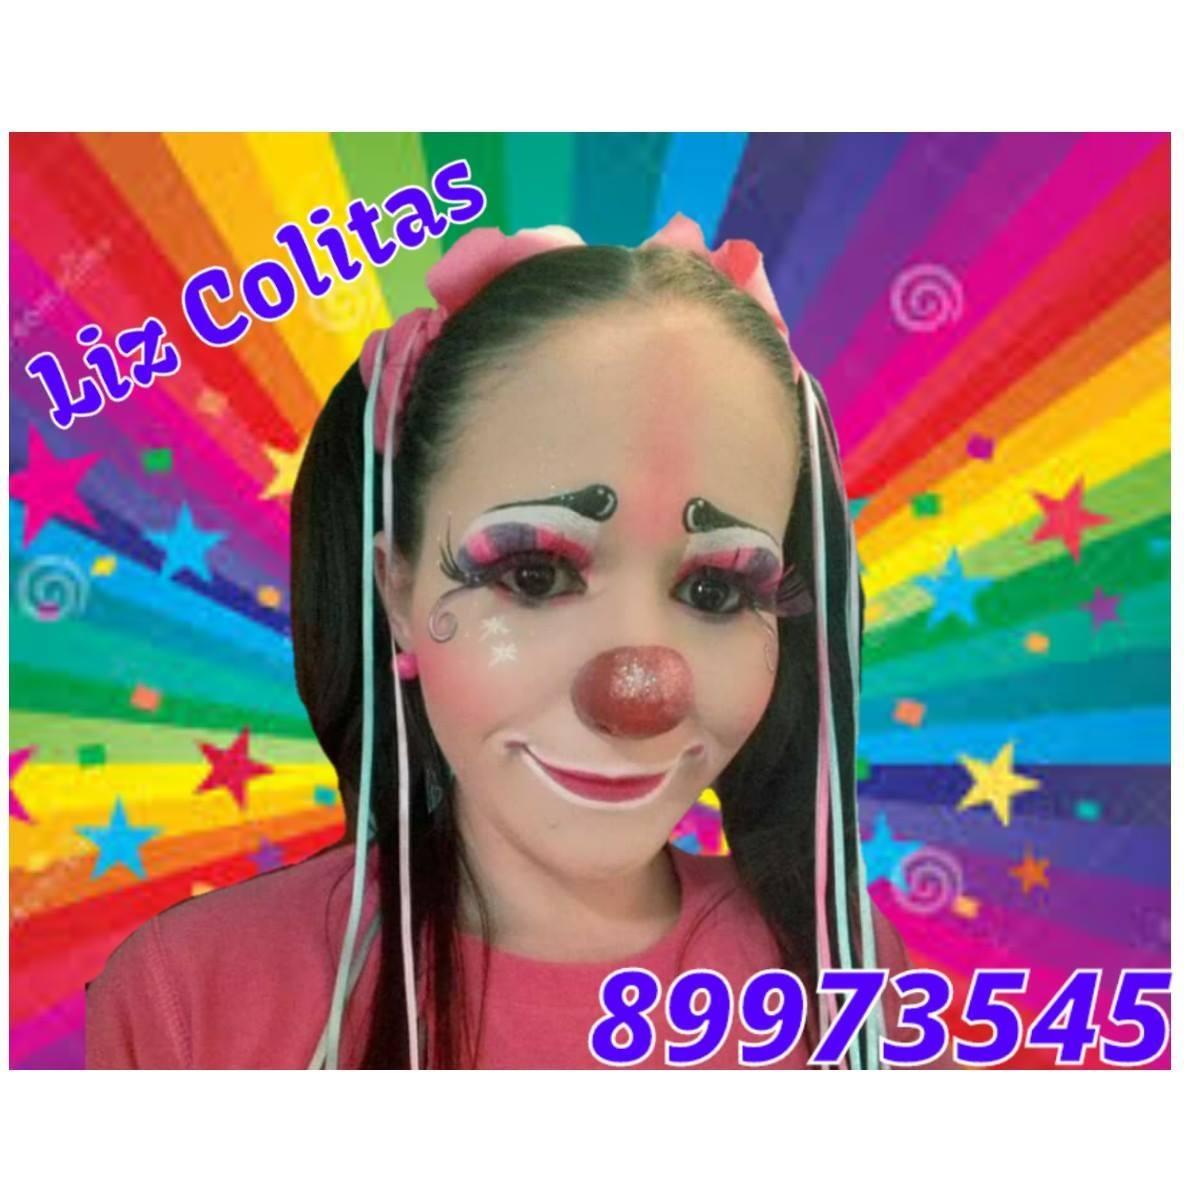 18121393_1349965075090421_2995954573457558197_o